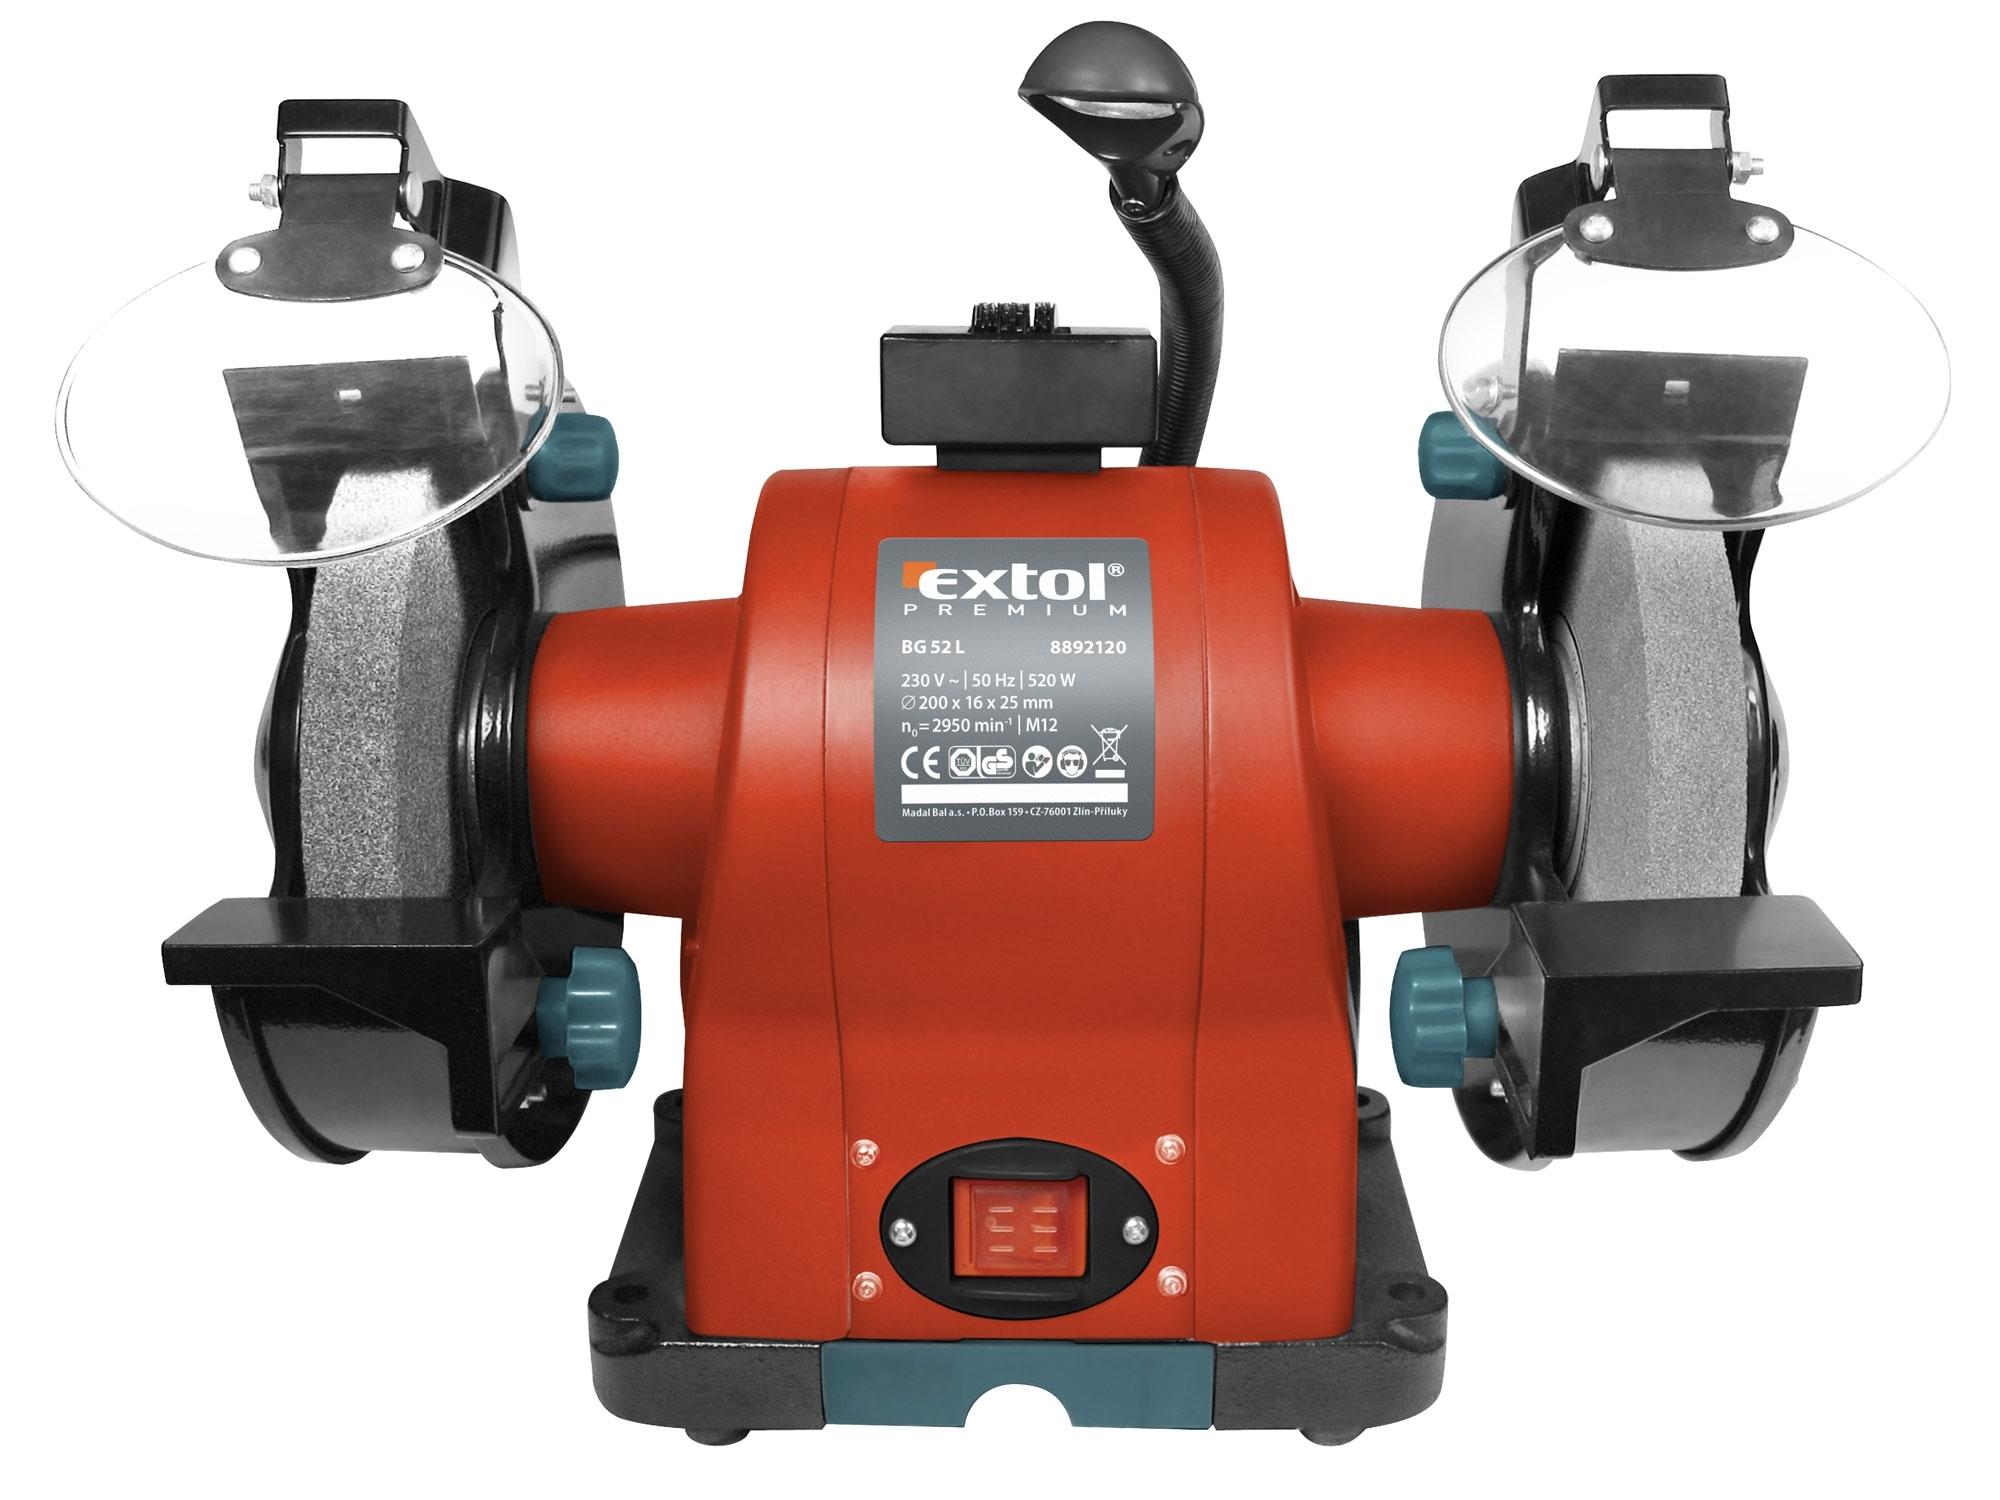 Bruska dvoukotoučová 200 mm  520 W s osvětlením Extol Premium 8892120